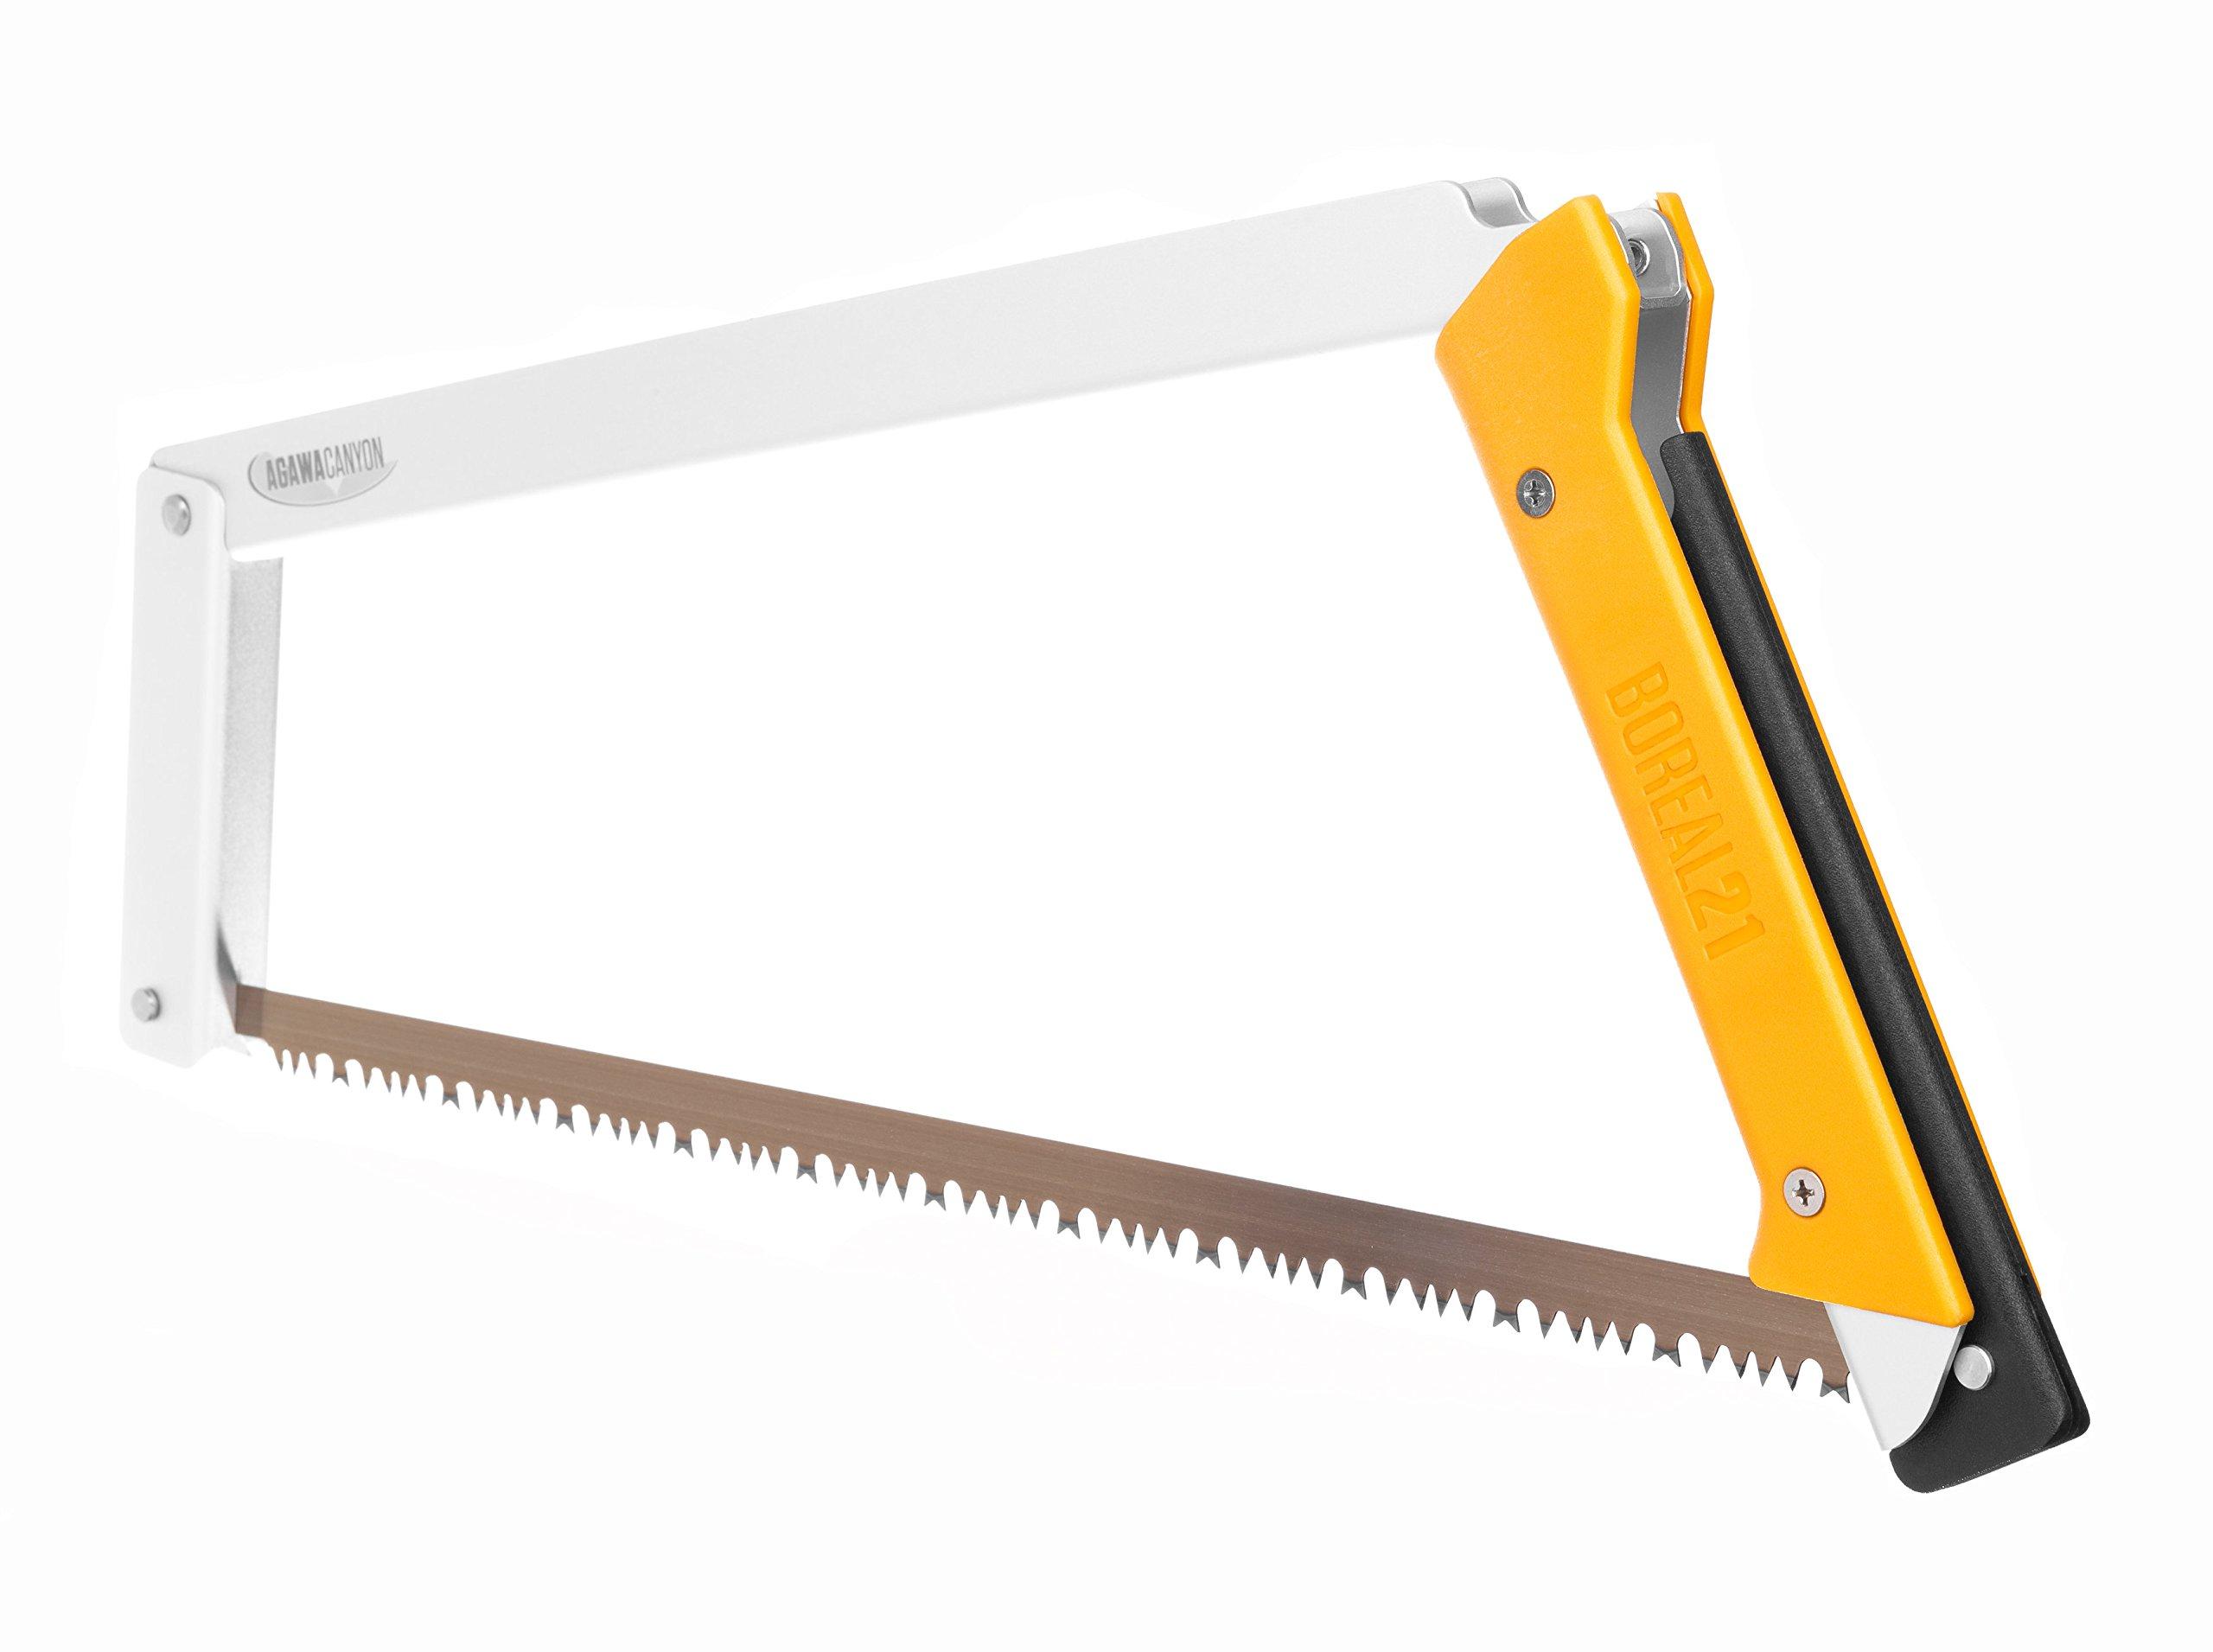 Agawa Canyon - BOREAL21 Folding Bow Saw - Clear Frame, Yellow Handle, All-Purpose Blade